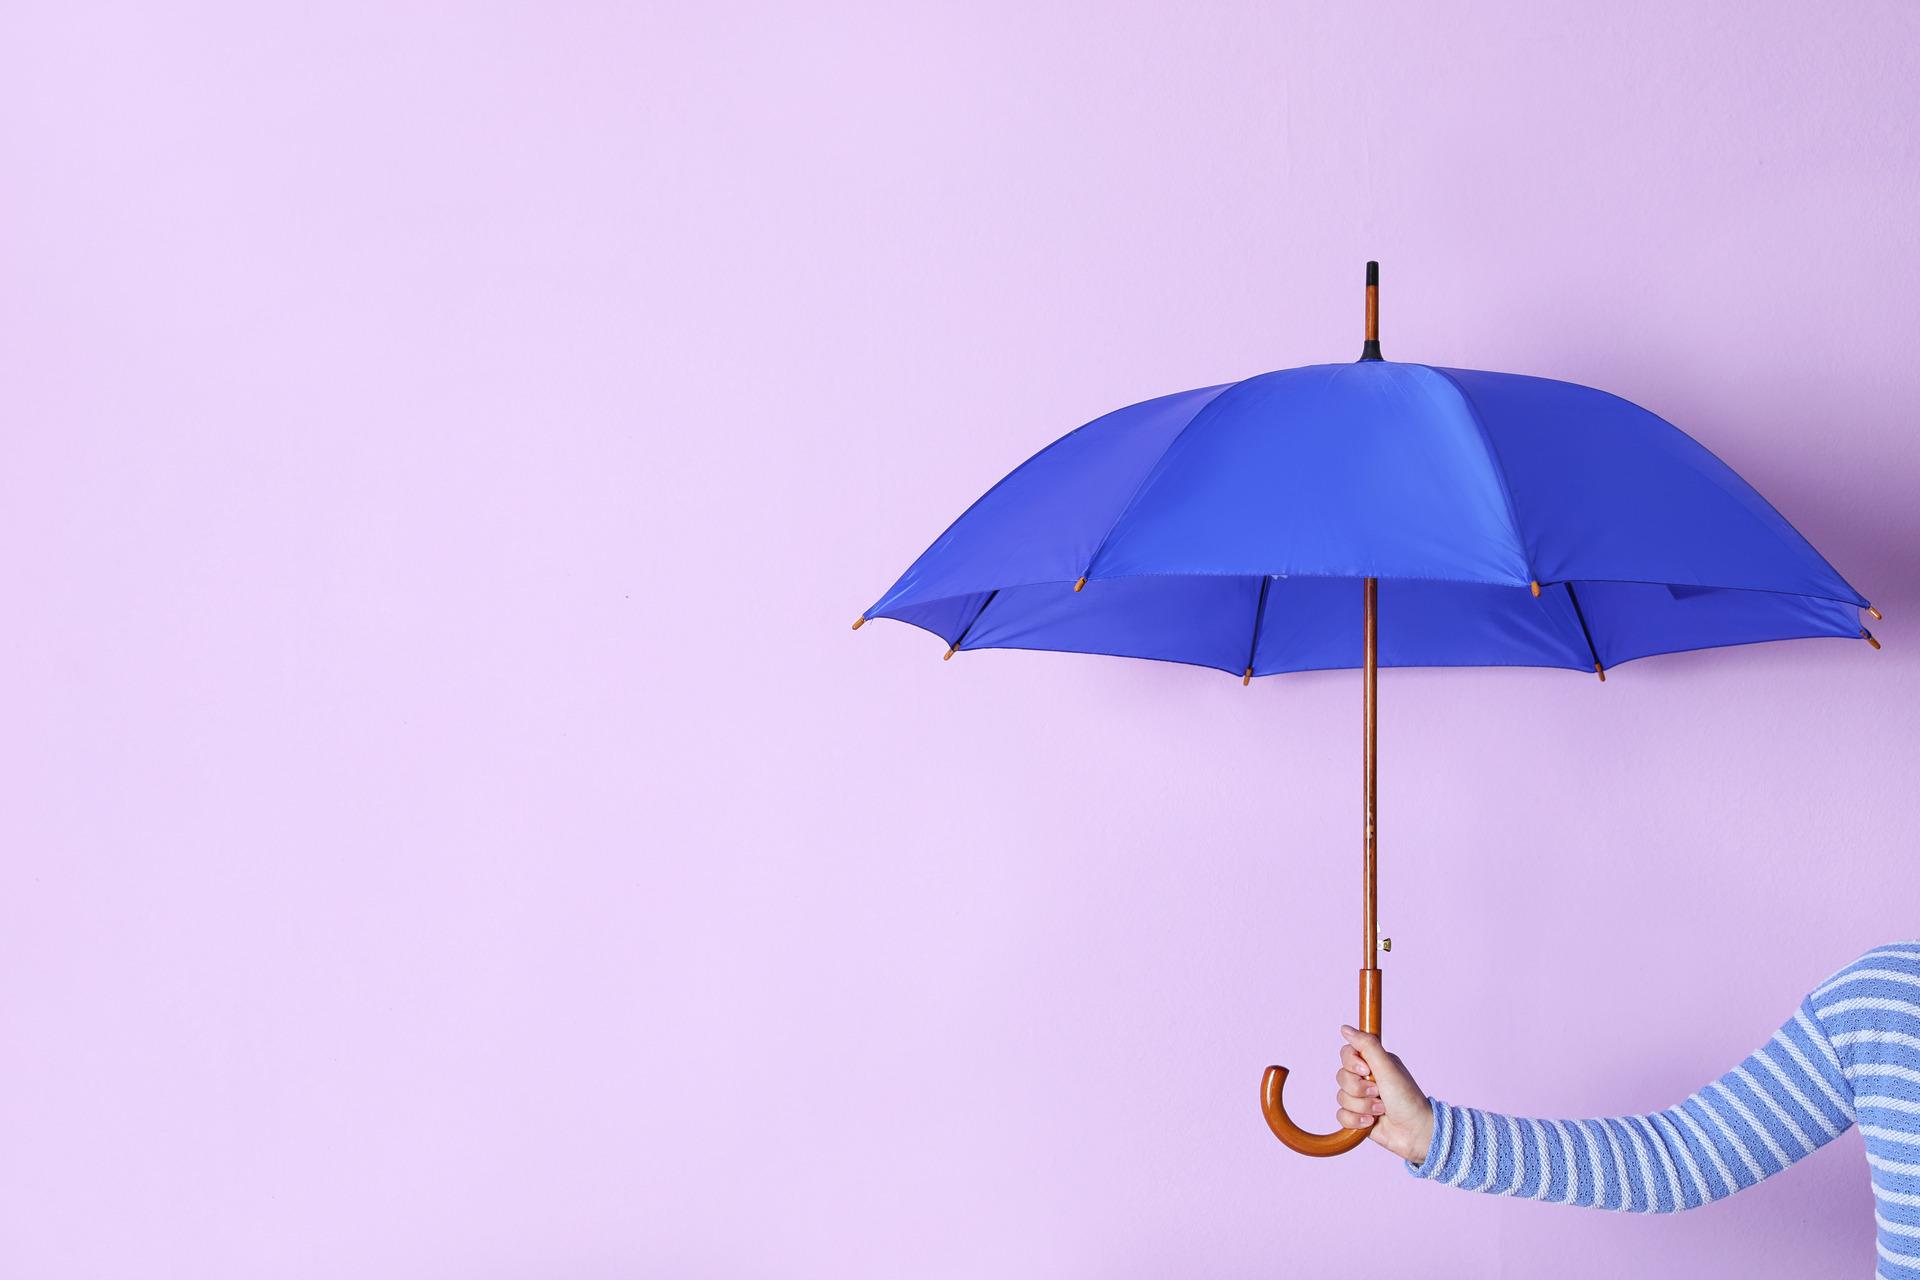 Ontario Personal Umbrella Liability Insurance